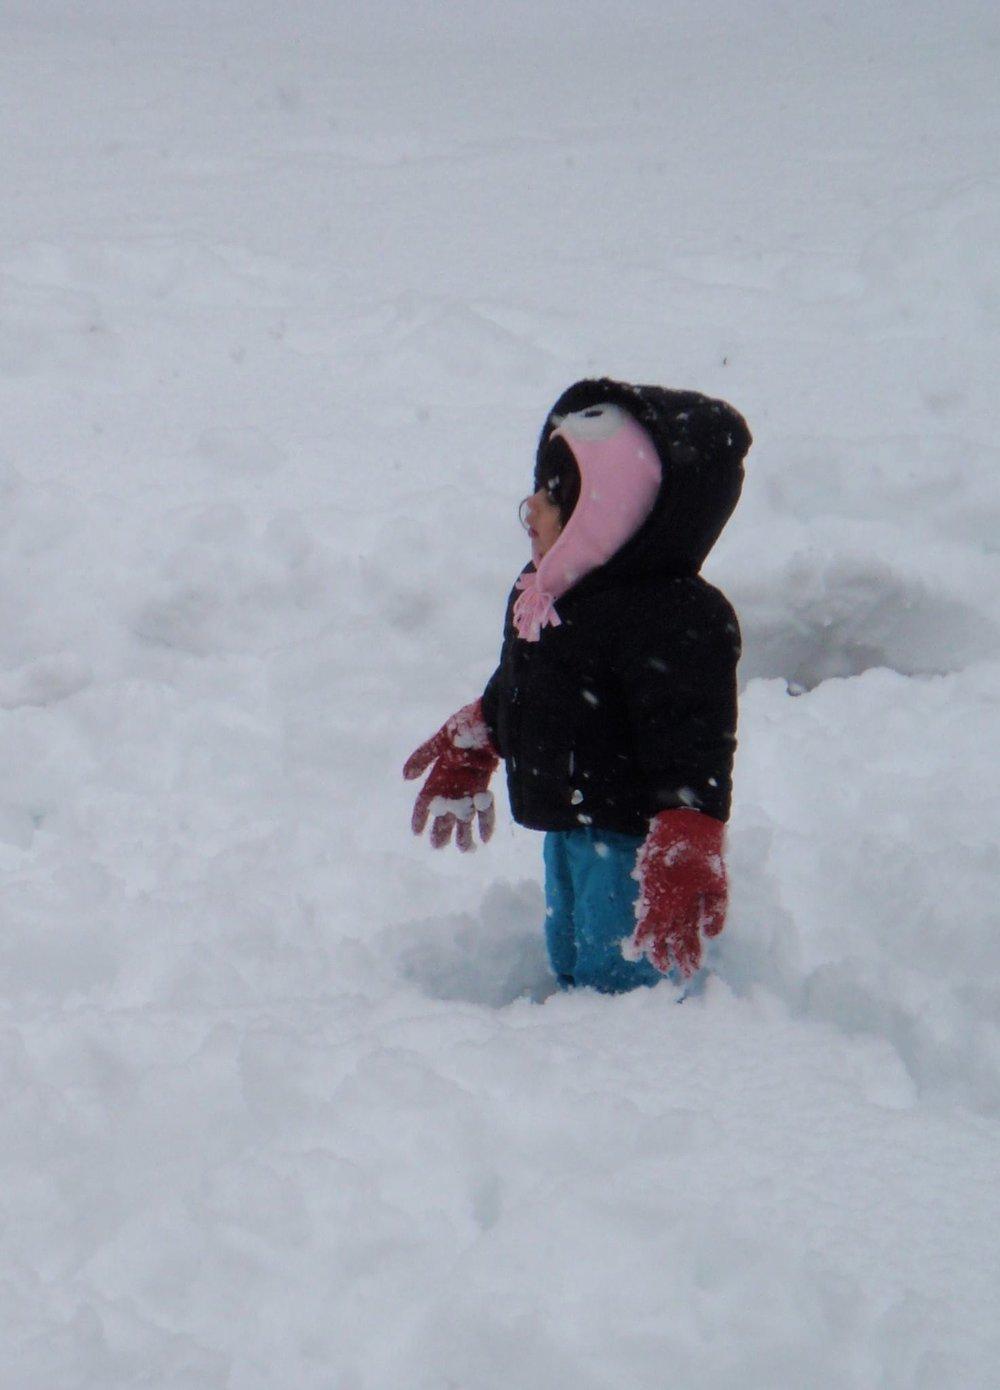 Fun Winter Backyard Activities